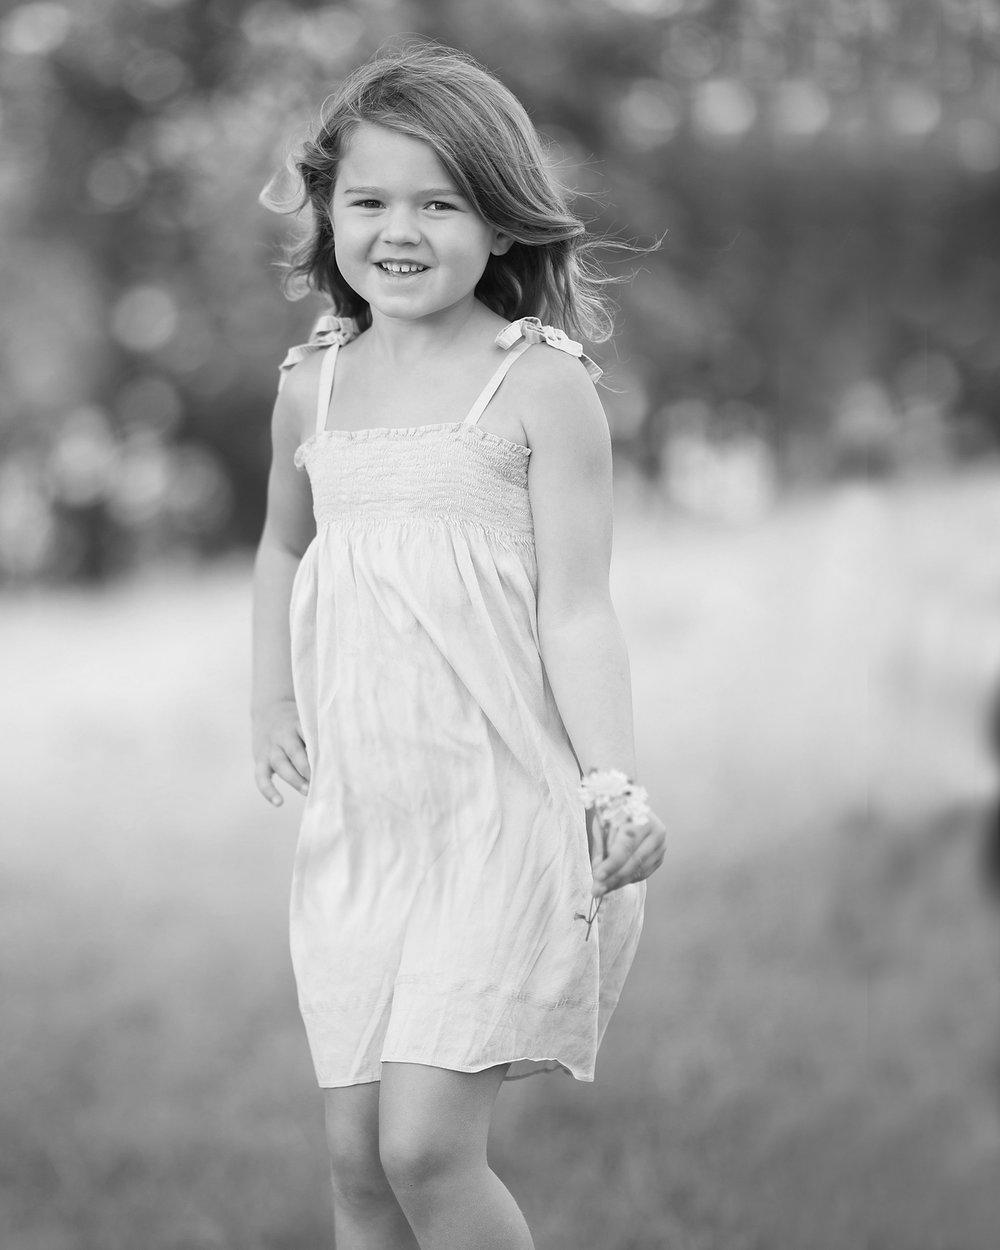 Maureen_Ford_Photography_Kids_0004.JPG